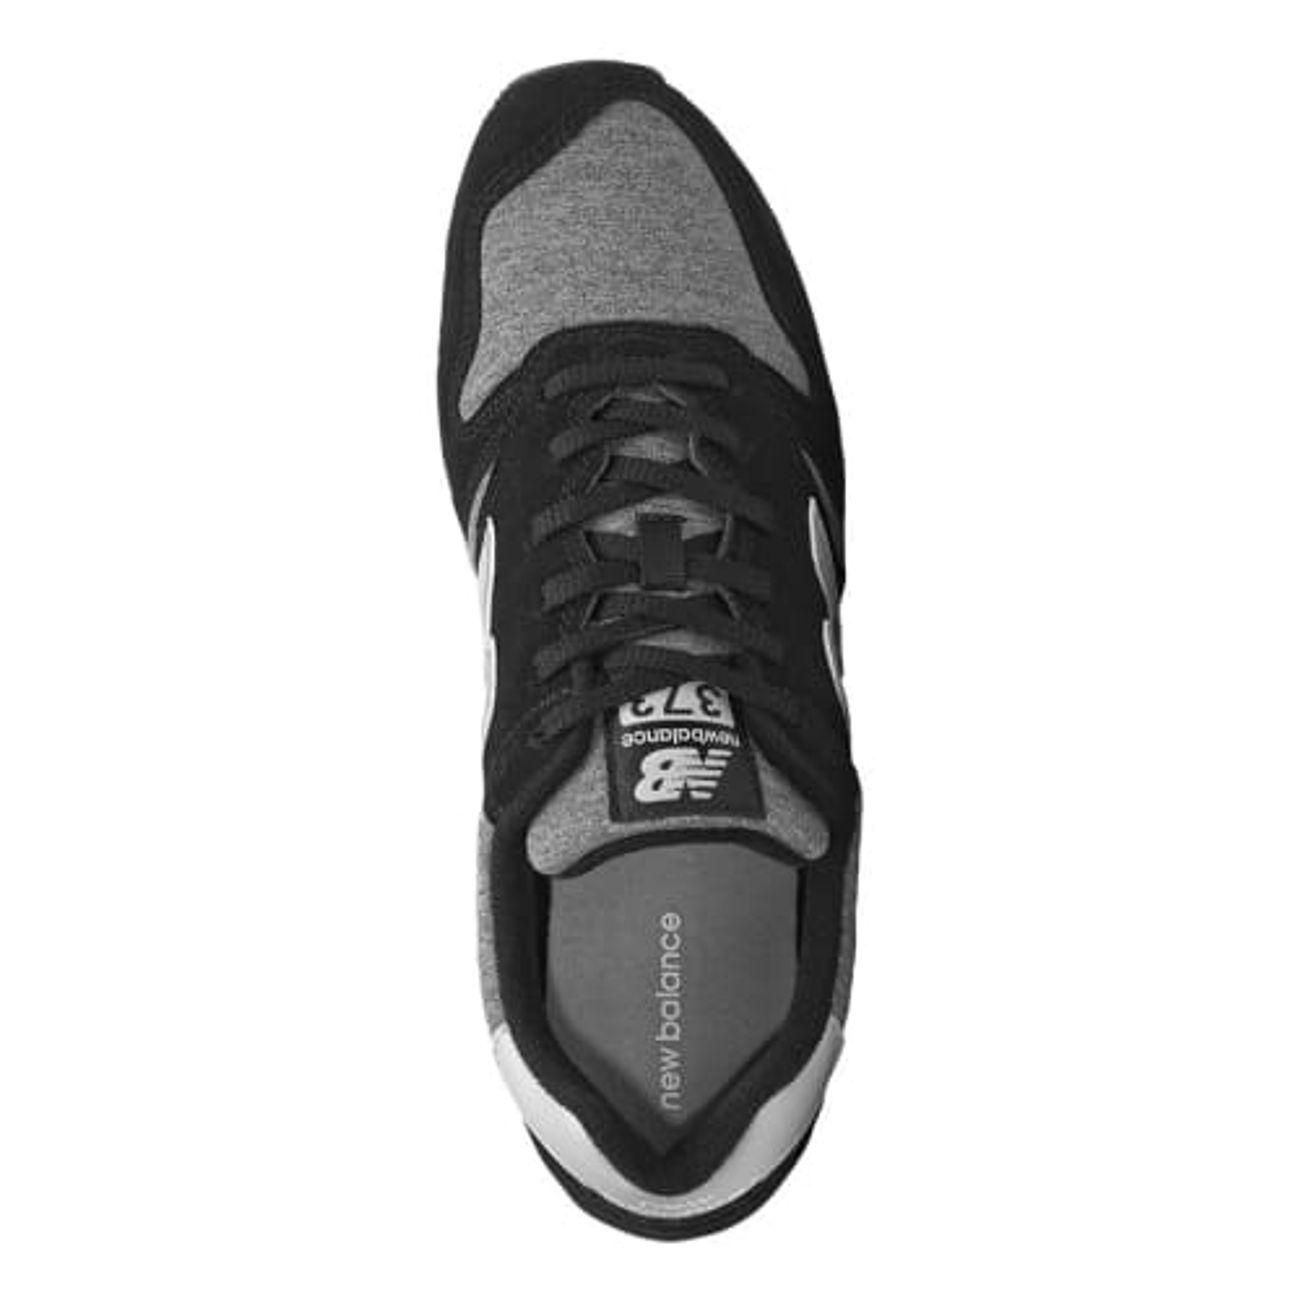 new balance 373 noir or